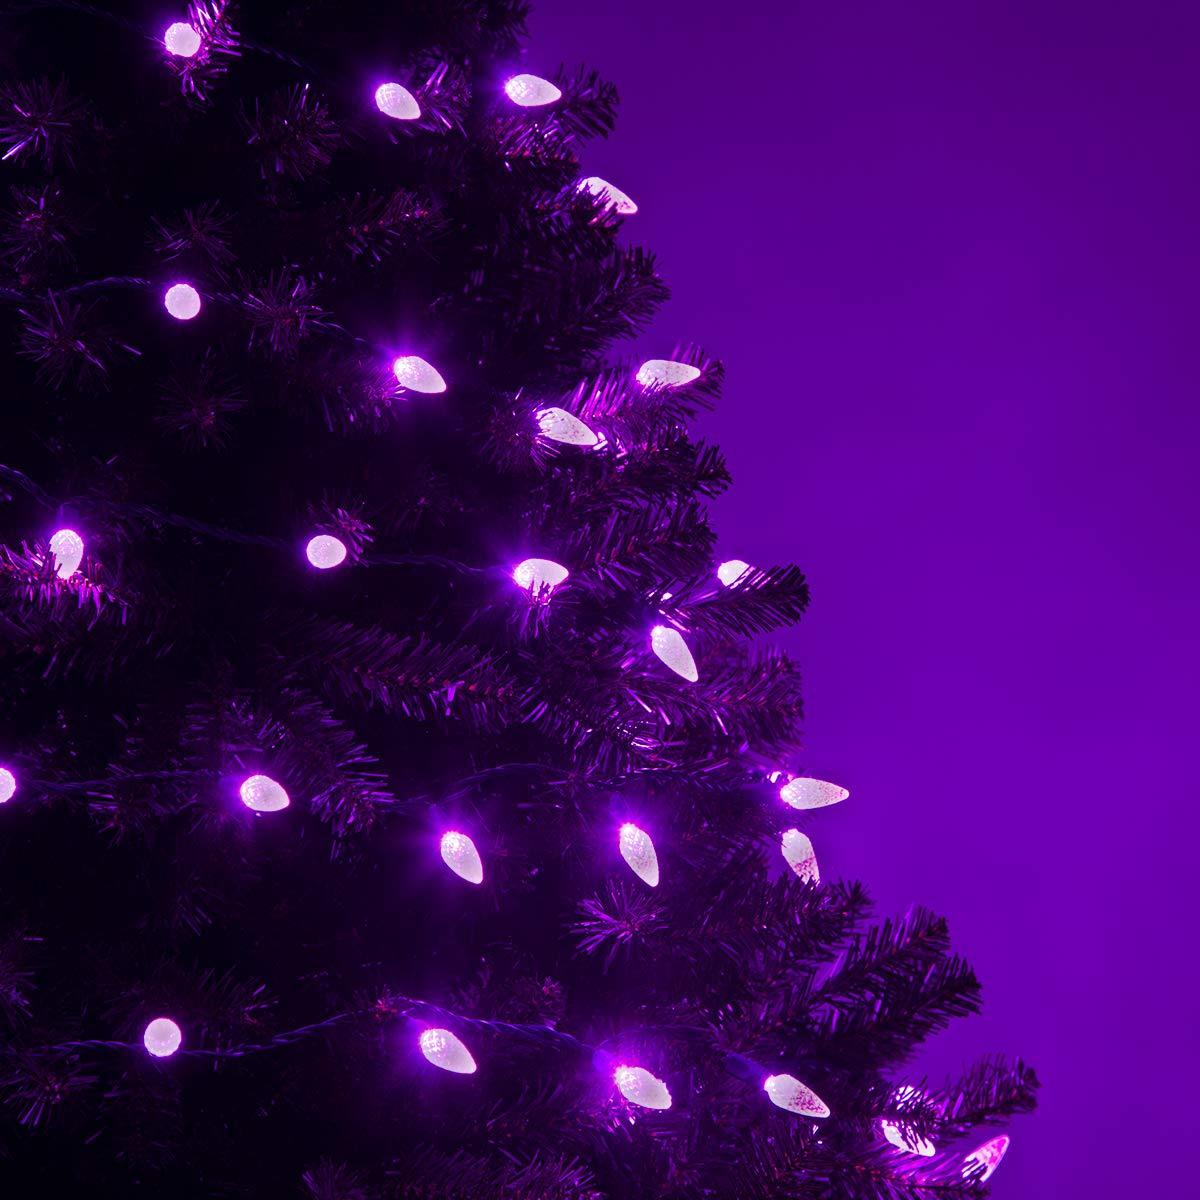 Purple Christmas Tree Lights.70 C6 Led Purple Lights Halloween Decorations Outdoor Christmas String Lights Halloween Lights Halloween String Lights For Bedroom